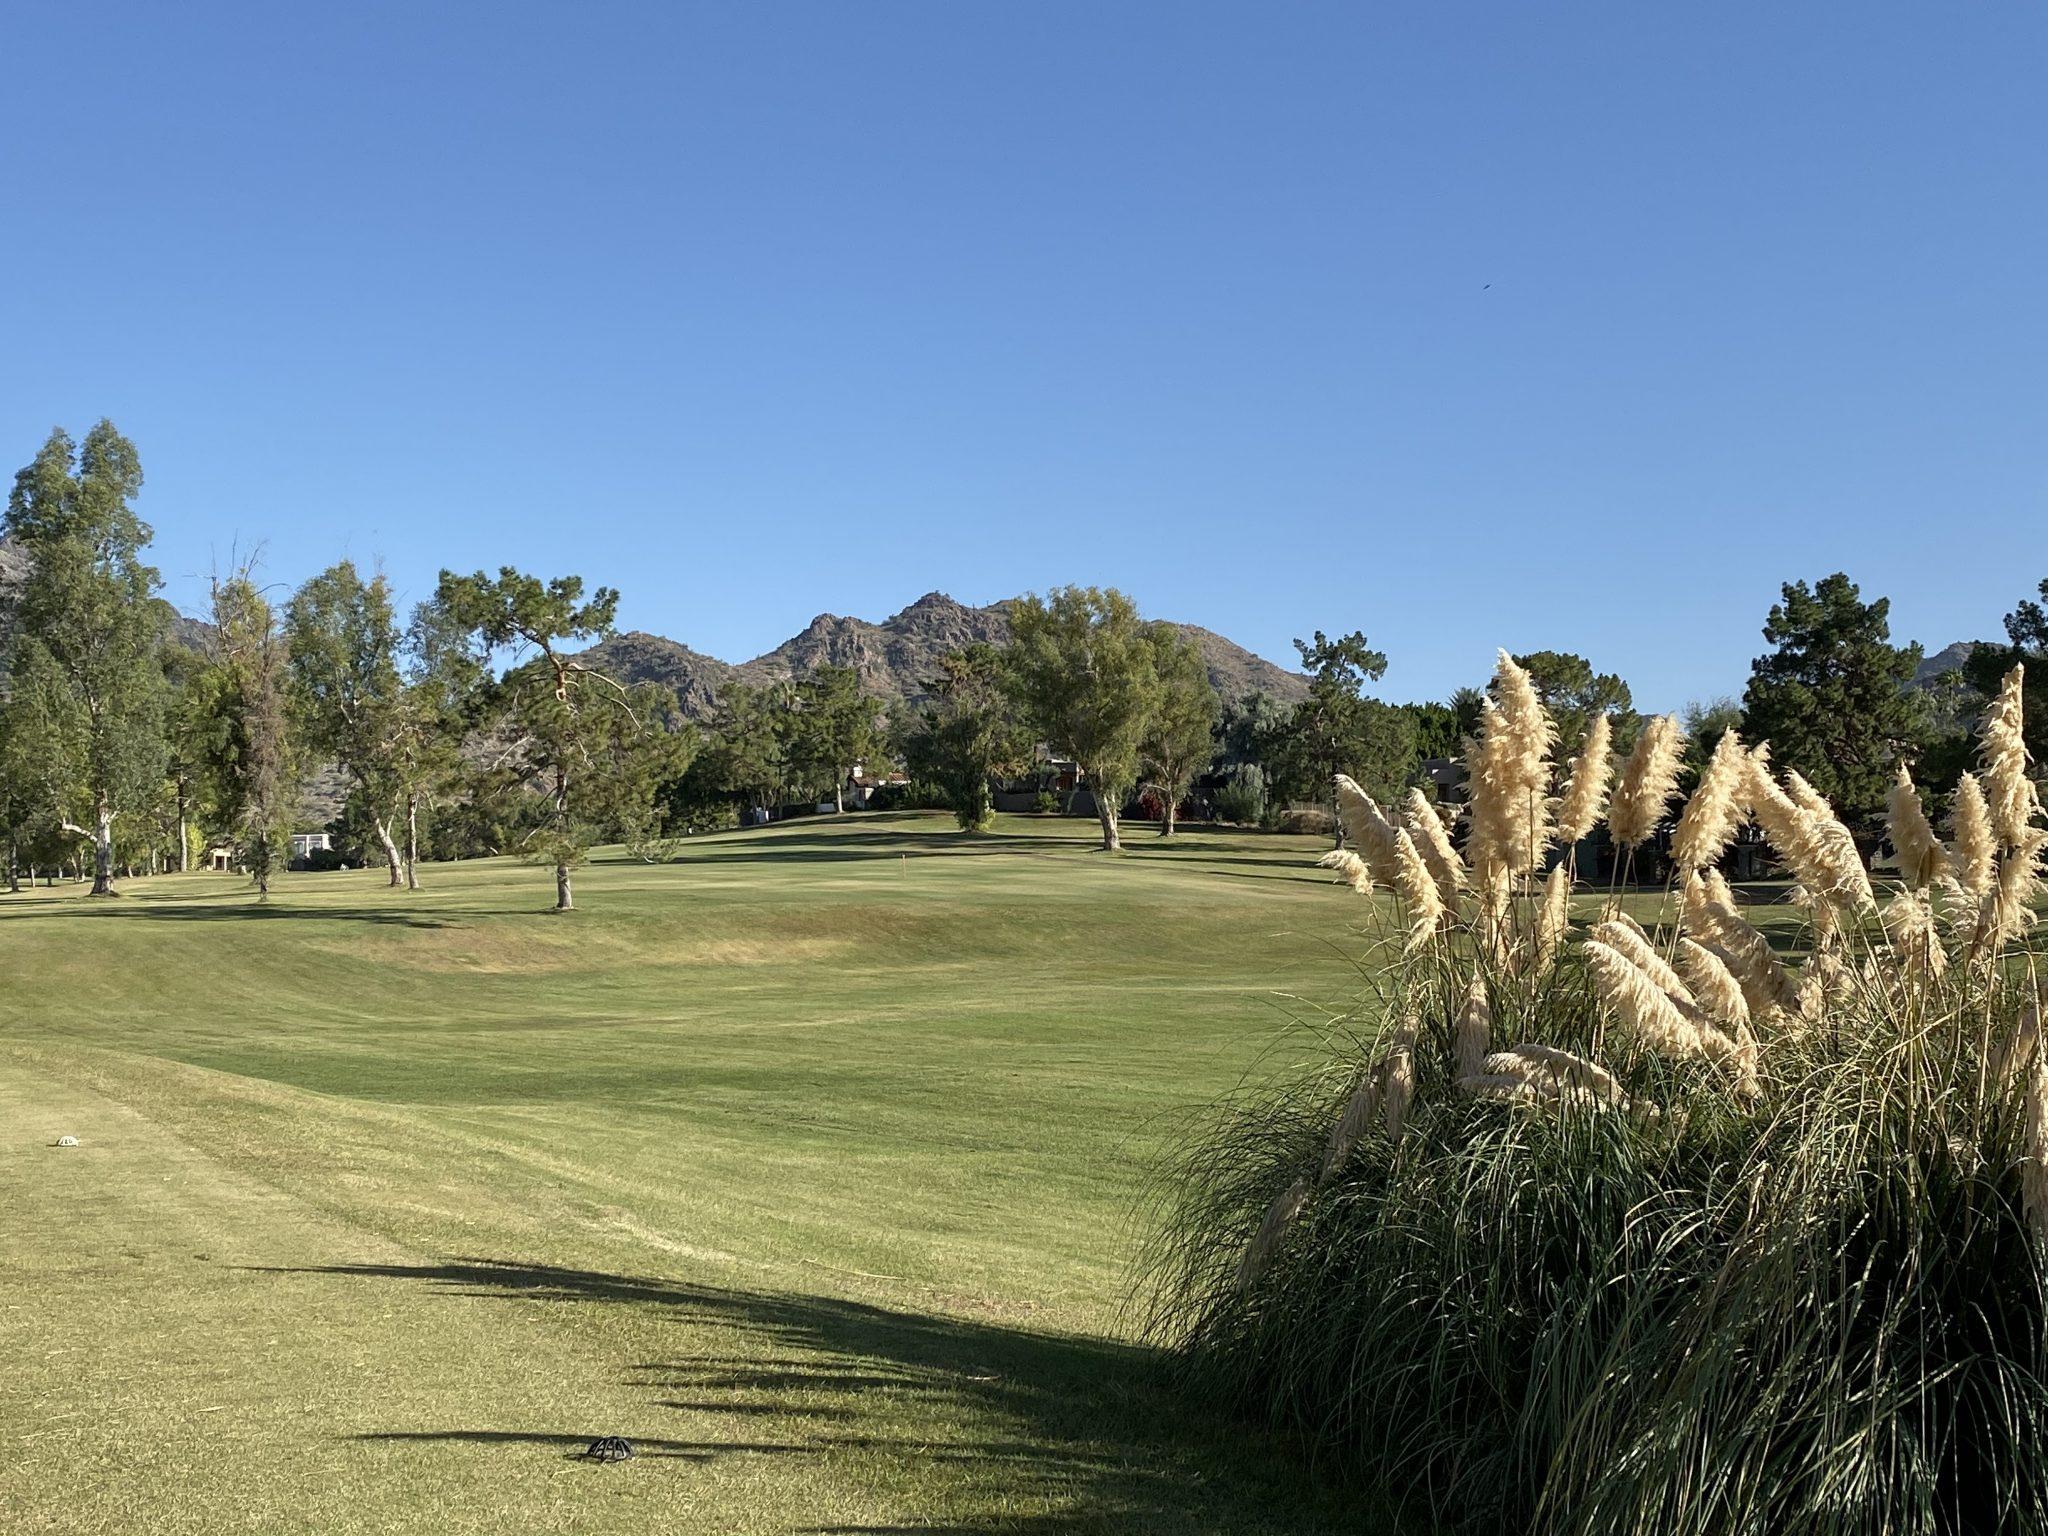 golf course at Arizona Biltmore Resort in Phoenix